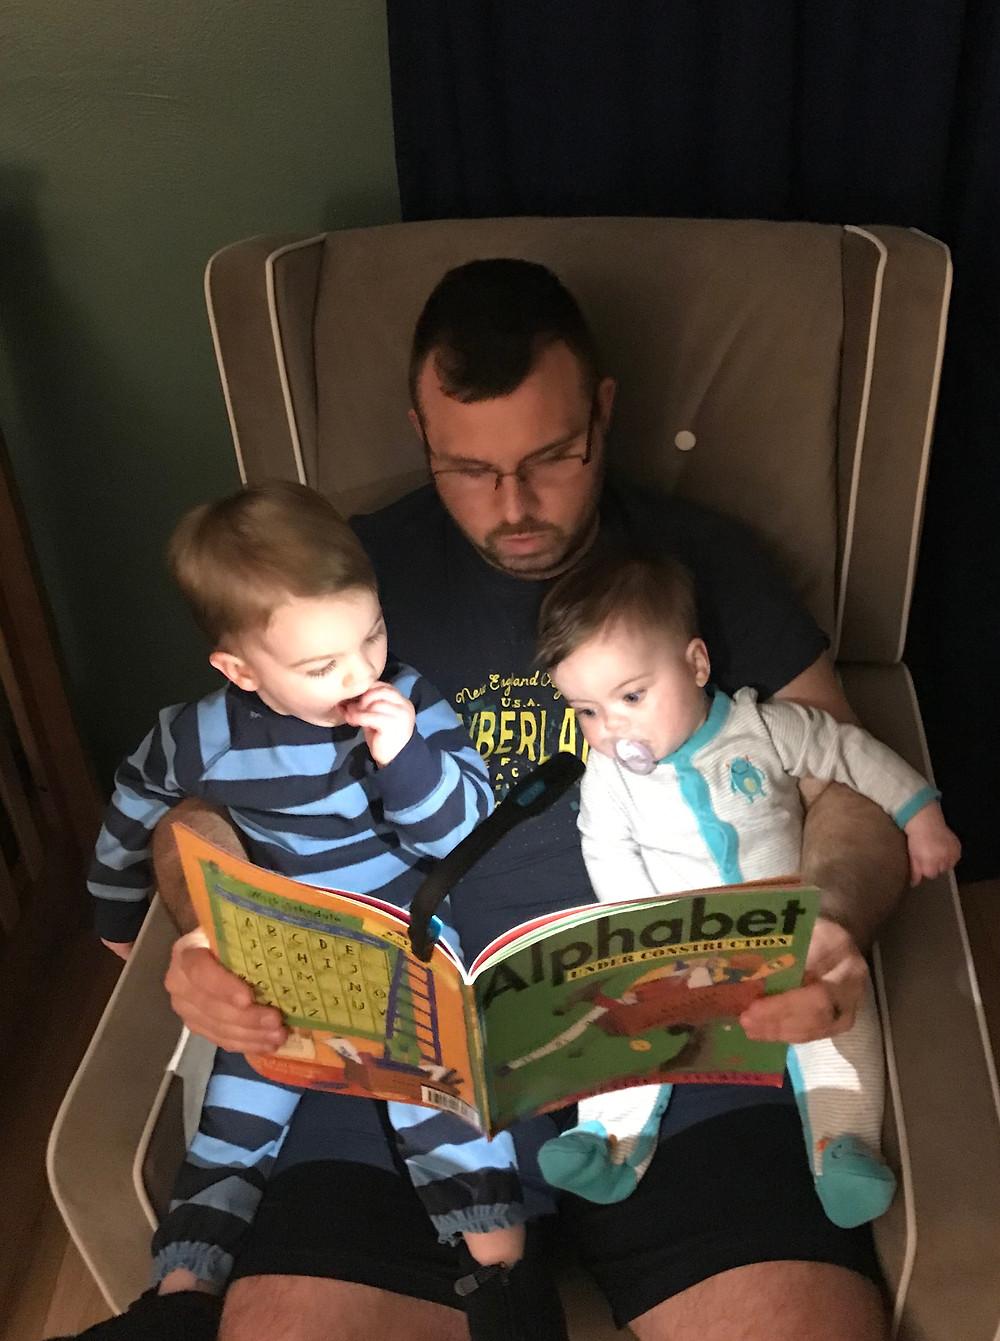 Little Bell Sleep Solutions, bedtime routine, best bedtime routine for two kids, bedtime stories, what's the best bedtime routine for babies, sleep consultant, Pittsburgh sleep coach